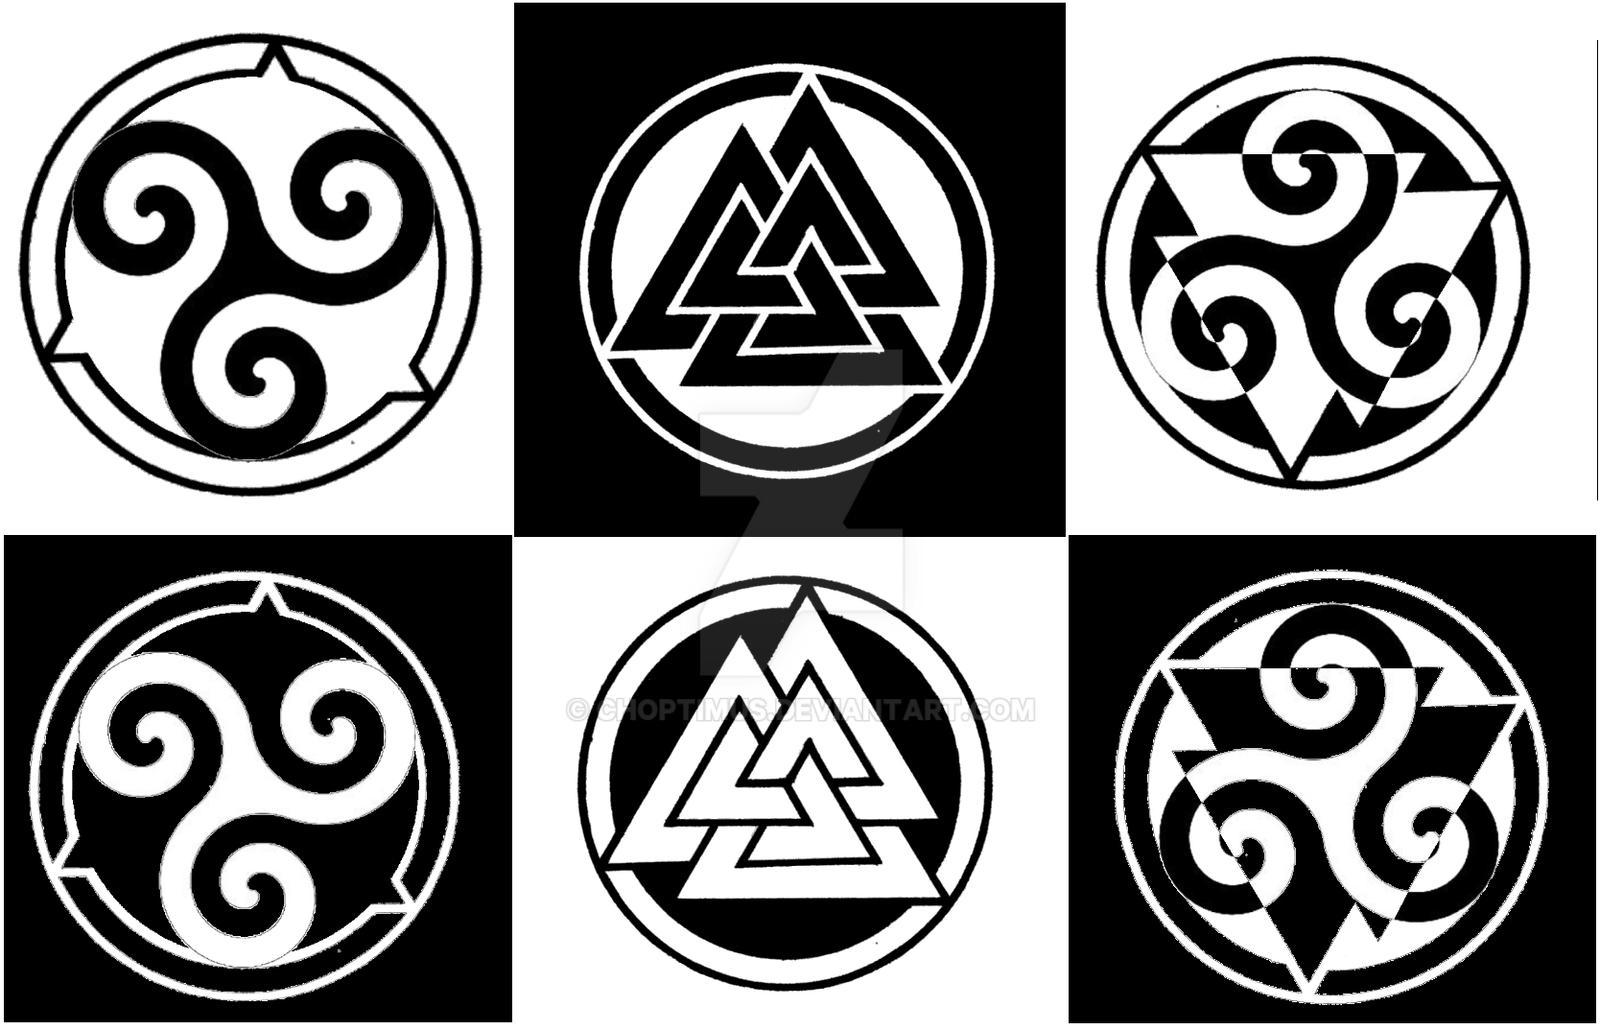 Triskelion and valknut by choptimus on deviantart for Valknut symbol tattoo